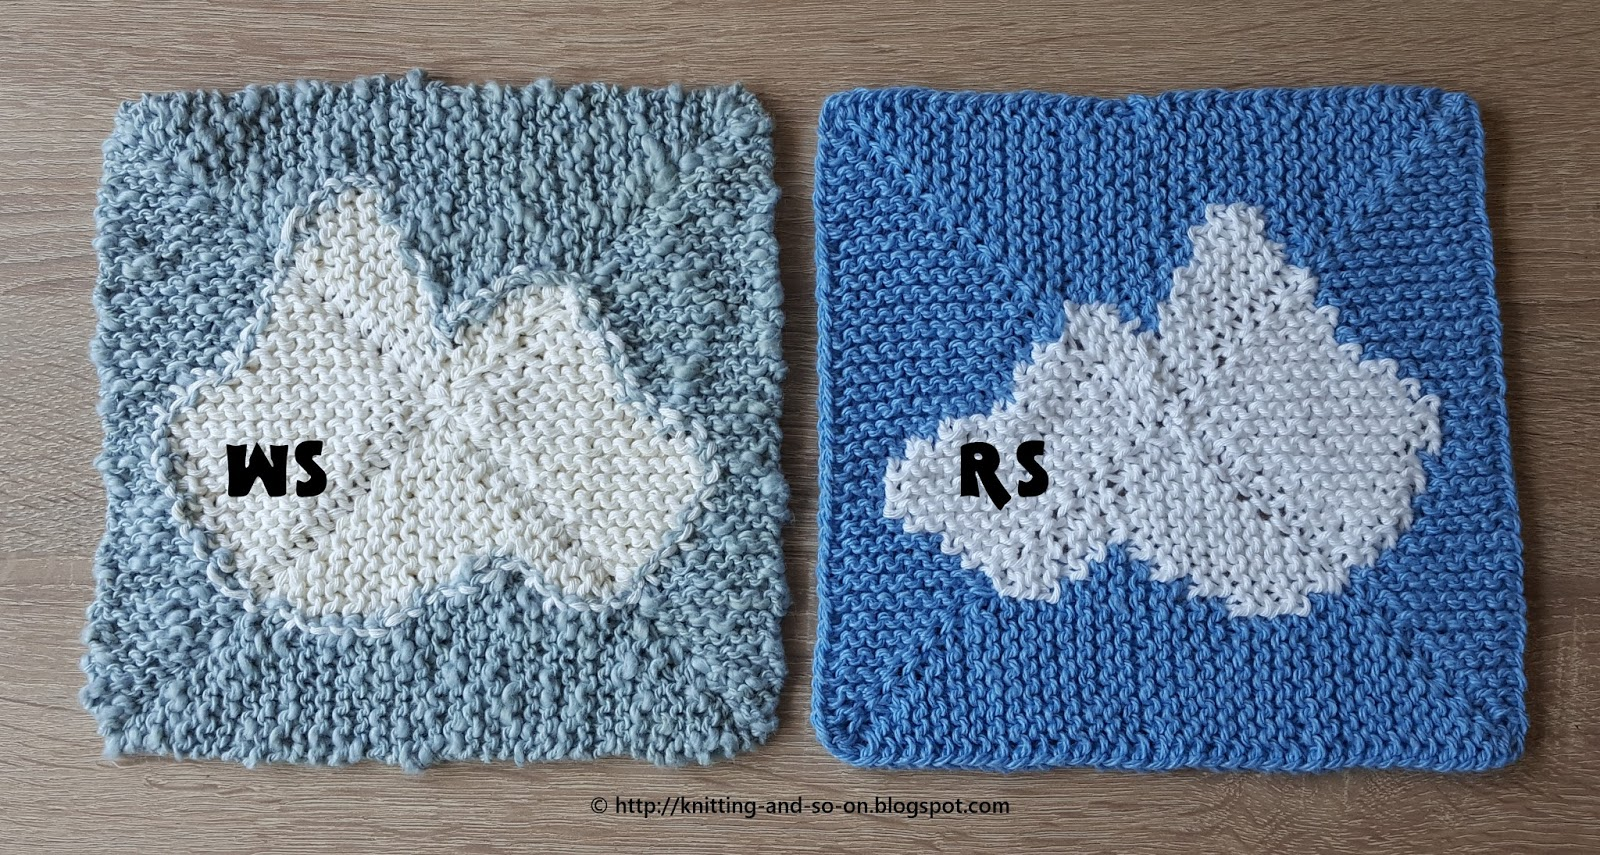 Knitting and so on: Wolkchen Washcloth